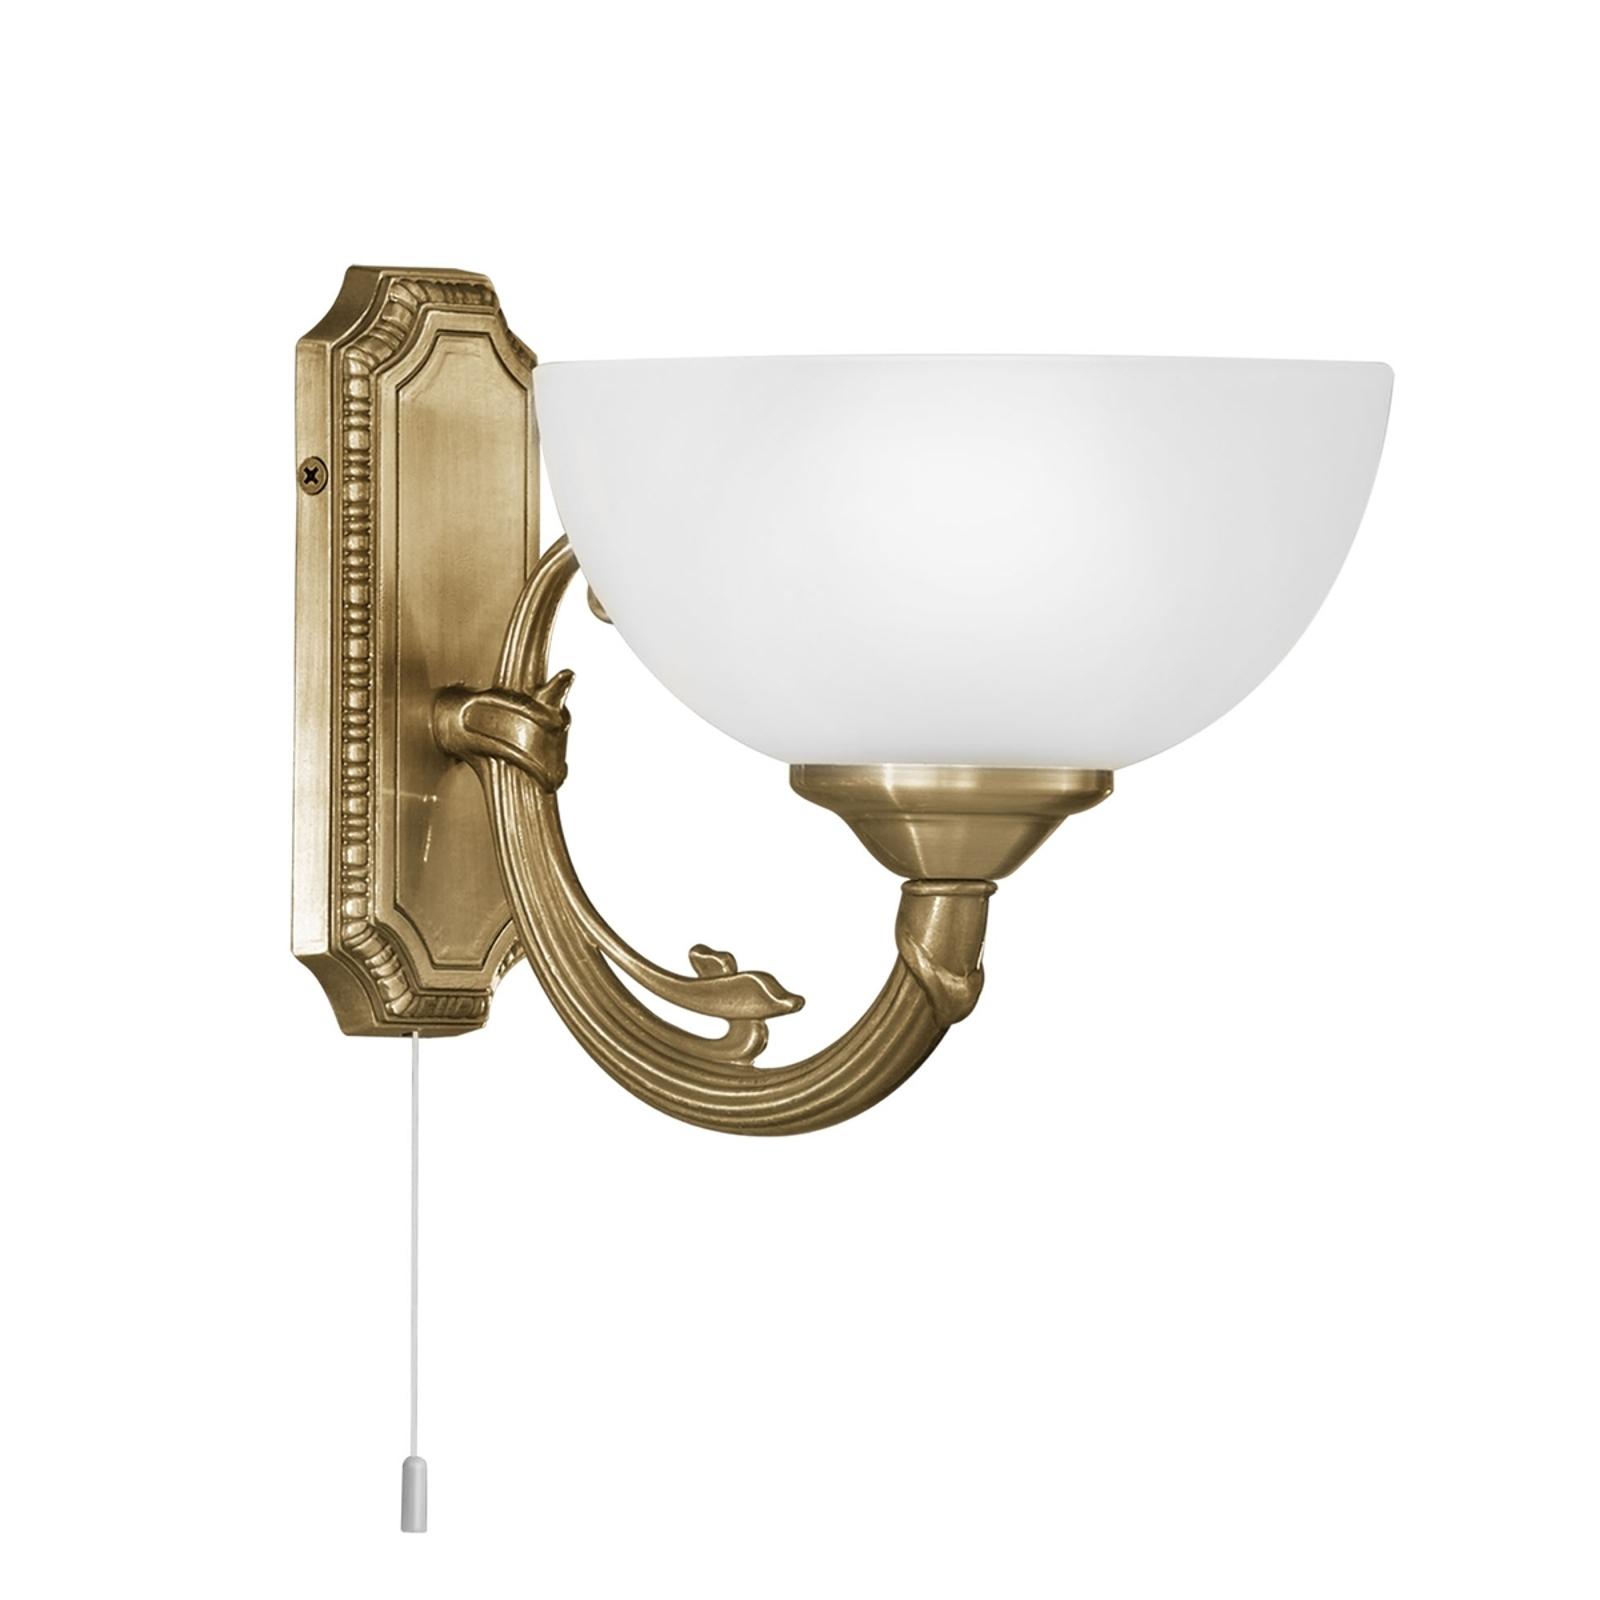 Vegglampe Savy, 1 lyskilde